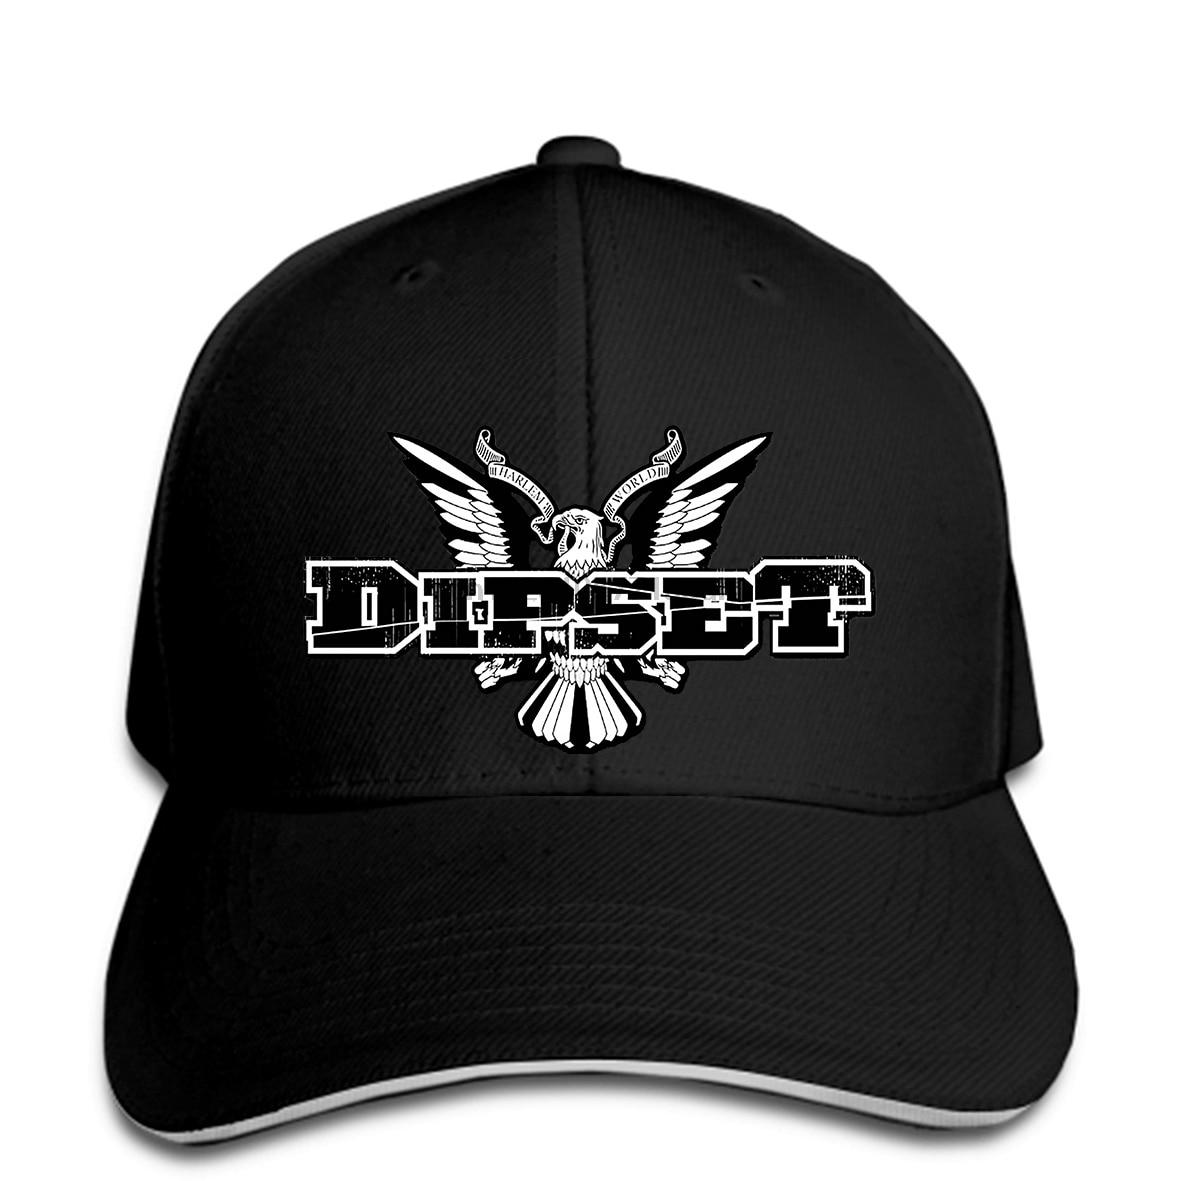 Baseball cap Fashion Dipset Diplomats Graphic Logo Print hat Summer Cool Classic